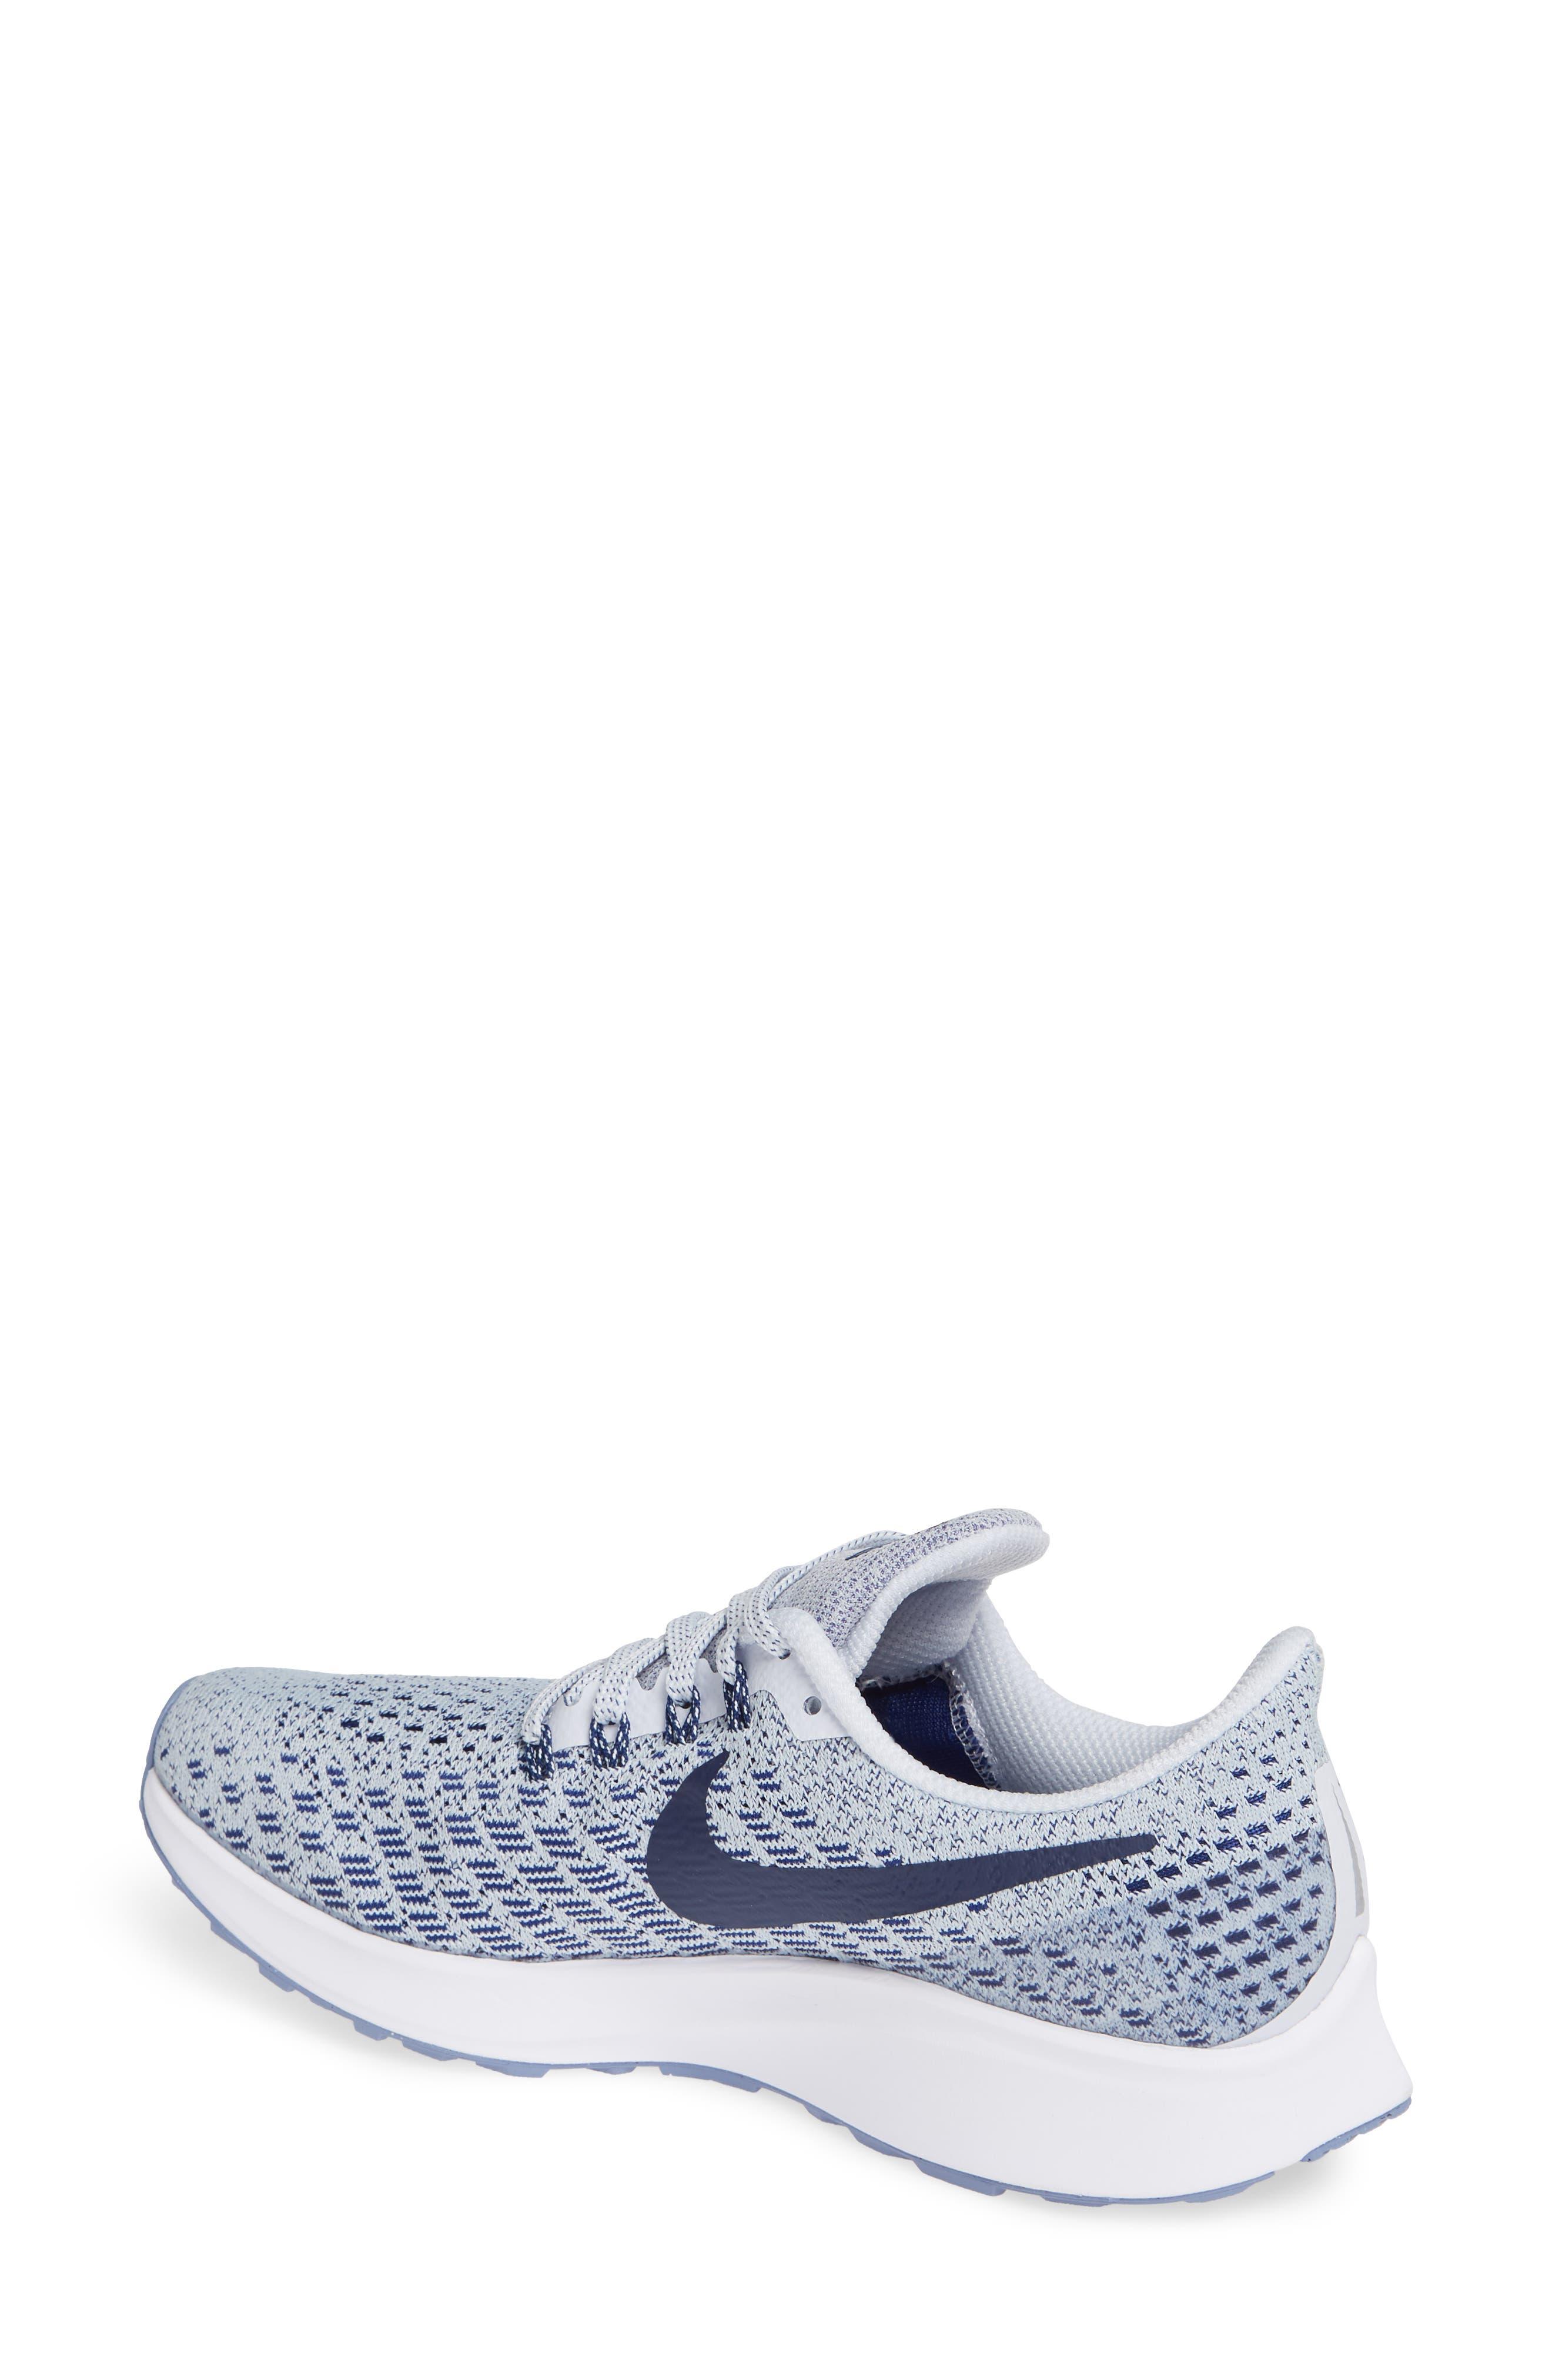 Air Zoom Pegasus 35 Running Shoe,                             Alternate thumbnail 2, color,                             GREY/ BLUE/ WHITE/ ALUMINUM